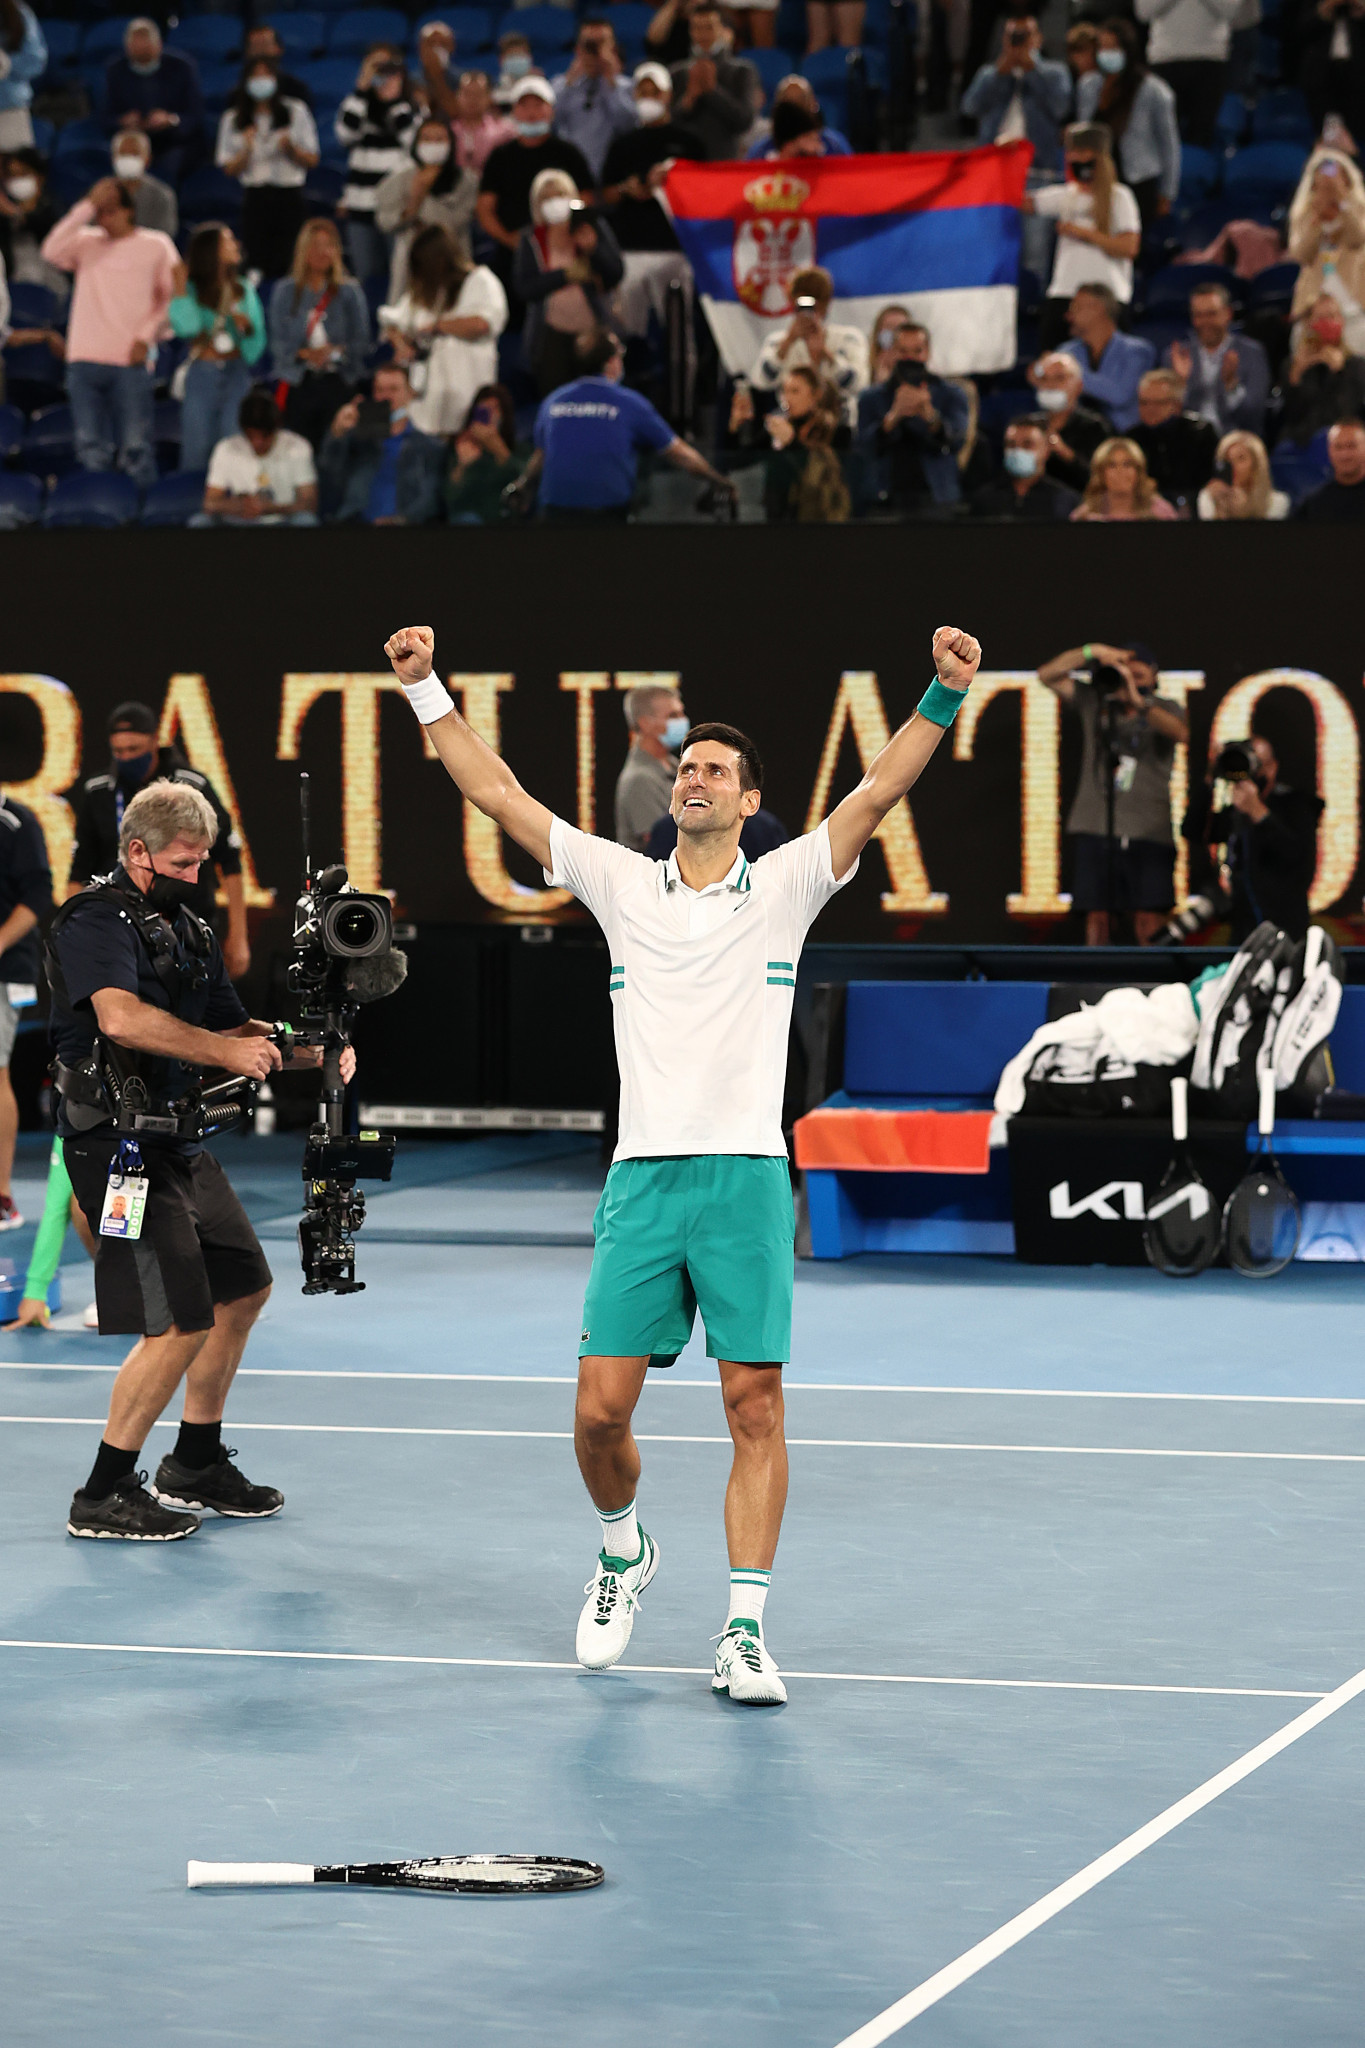 Djokovic retains Australian Open title to increase Grand Slam tally to 18